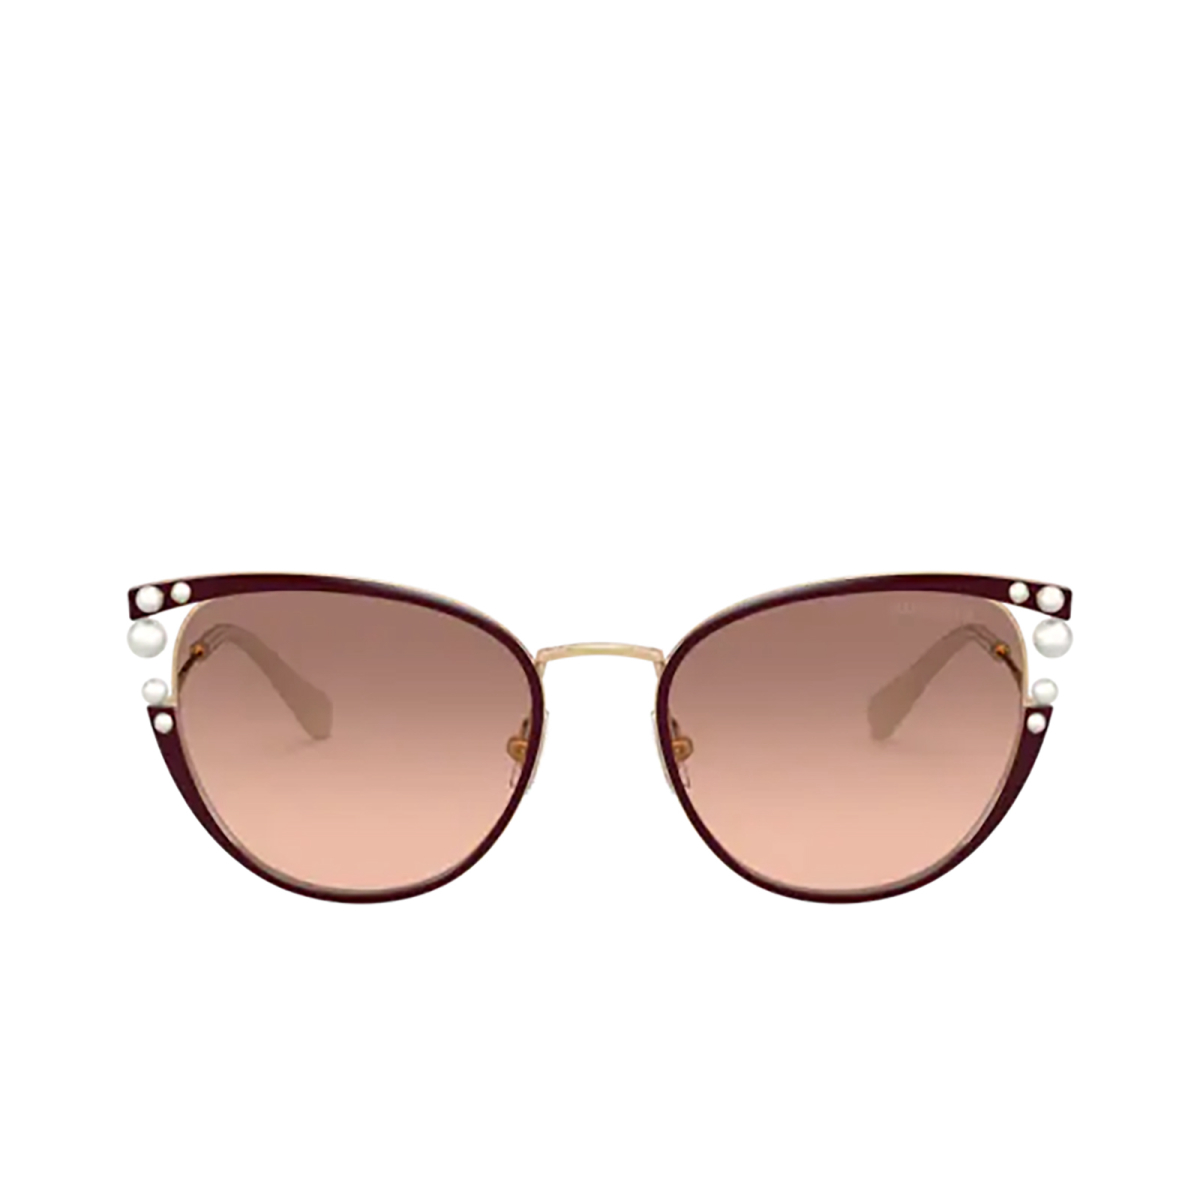 Miu Miu® Cat-eye Sunglasses: Core Collection MU 62VS color Bordeaux 04G0A5.